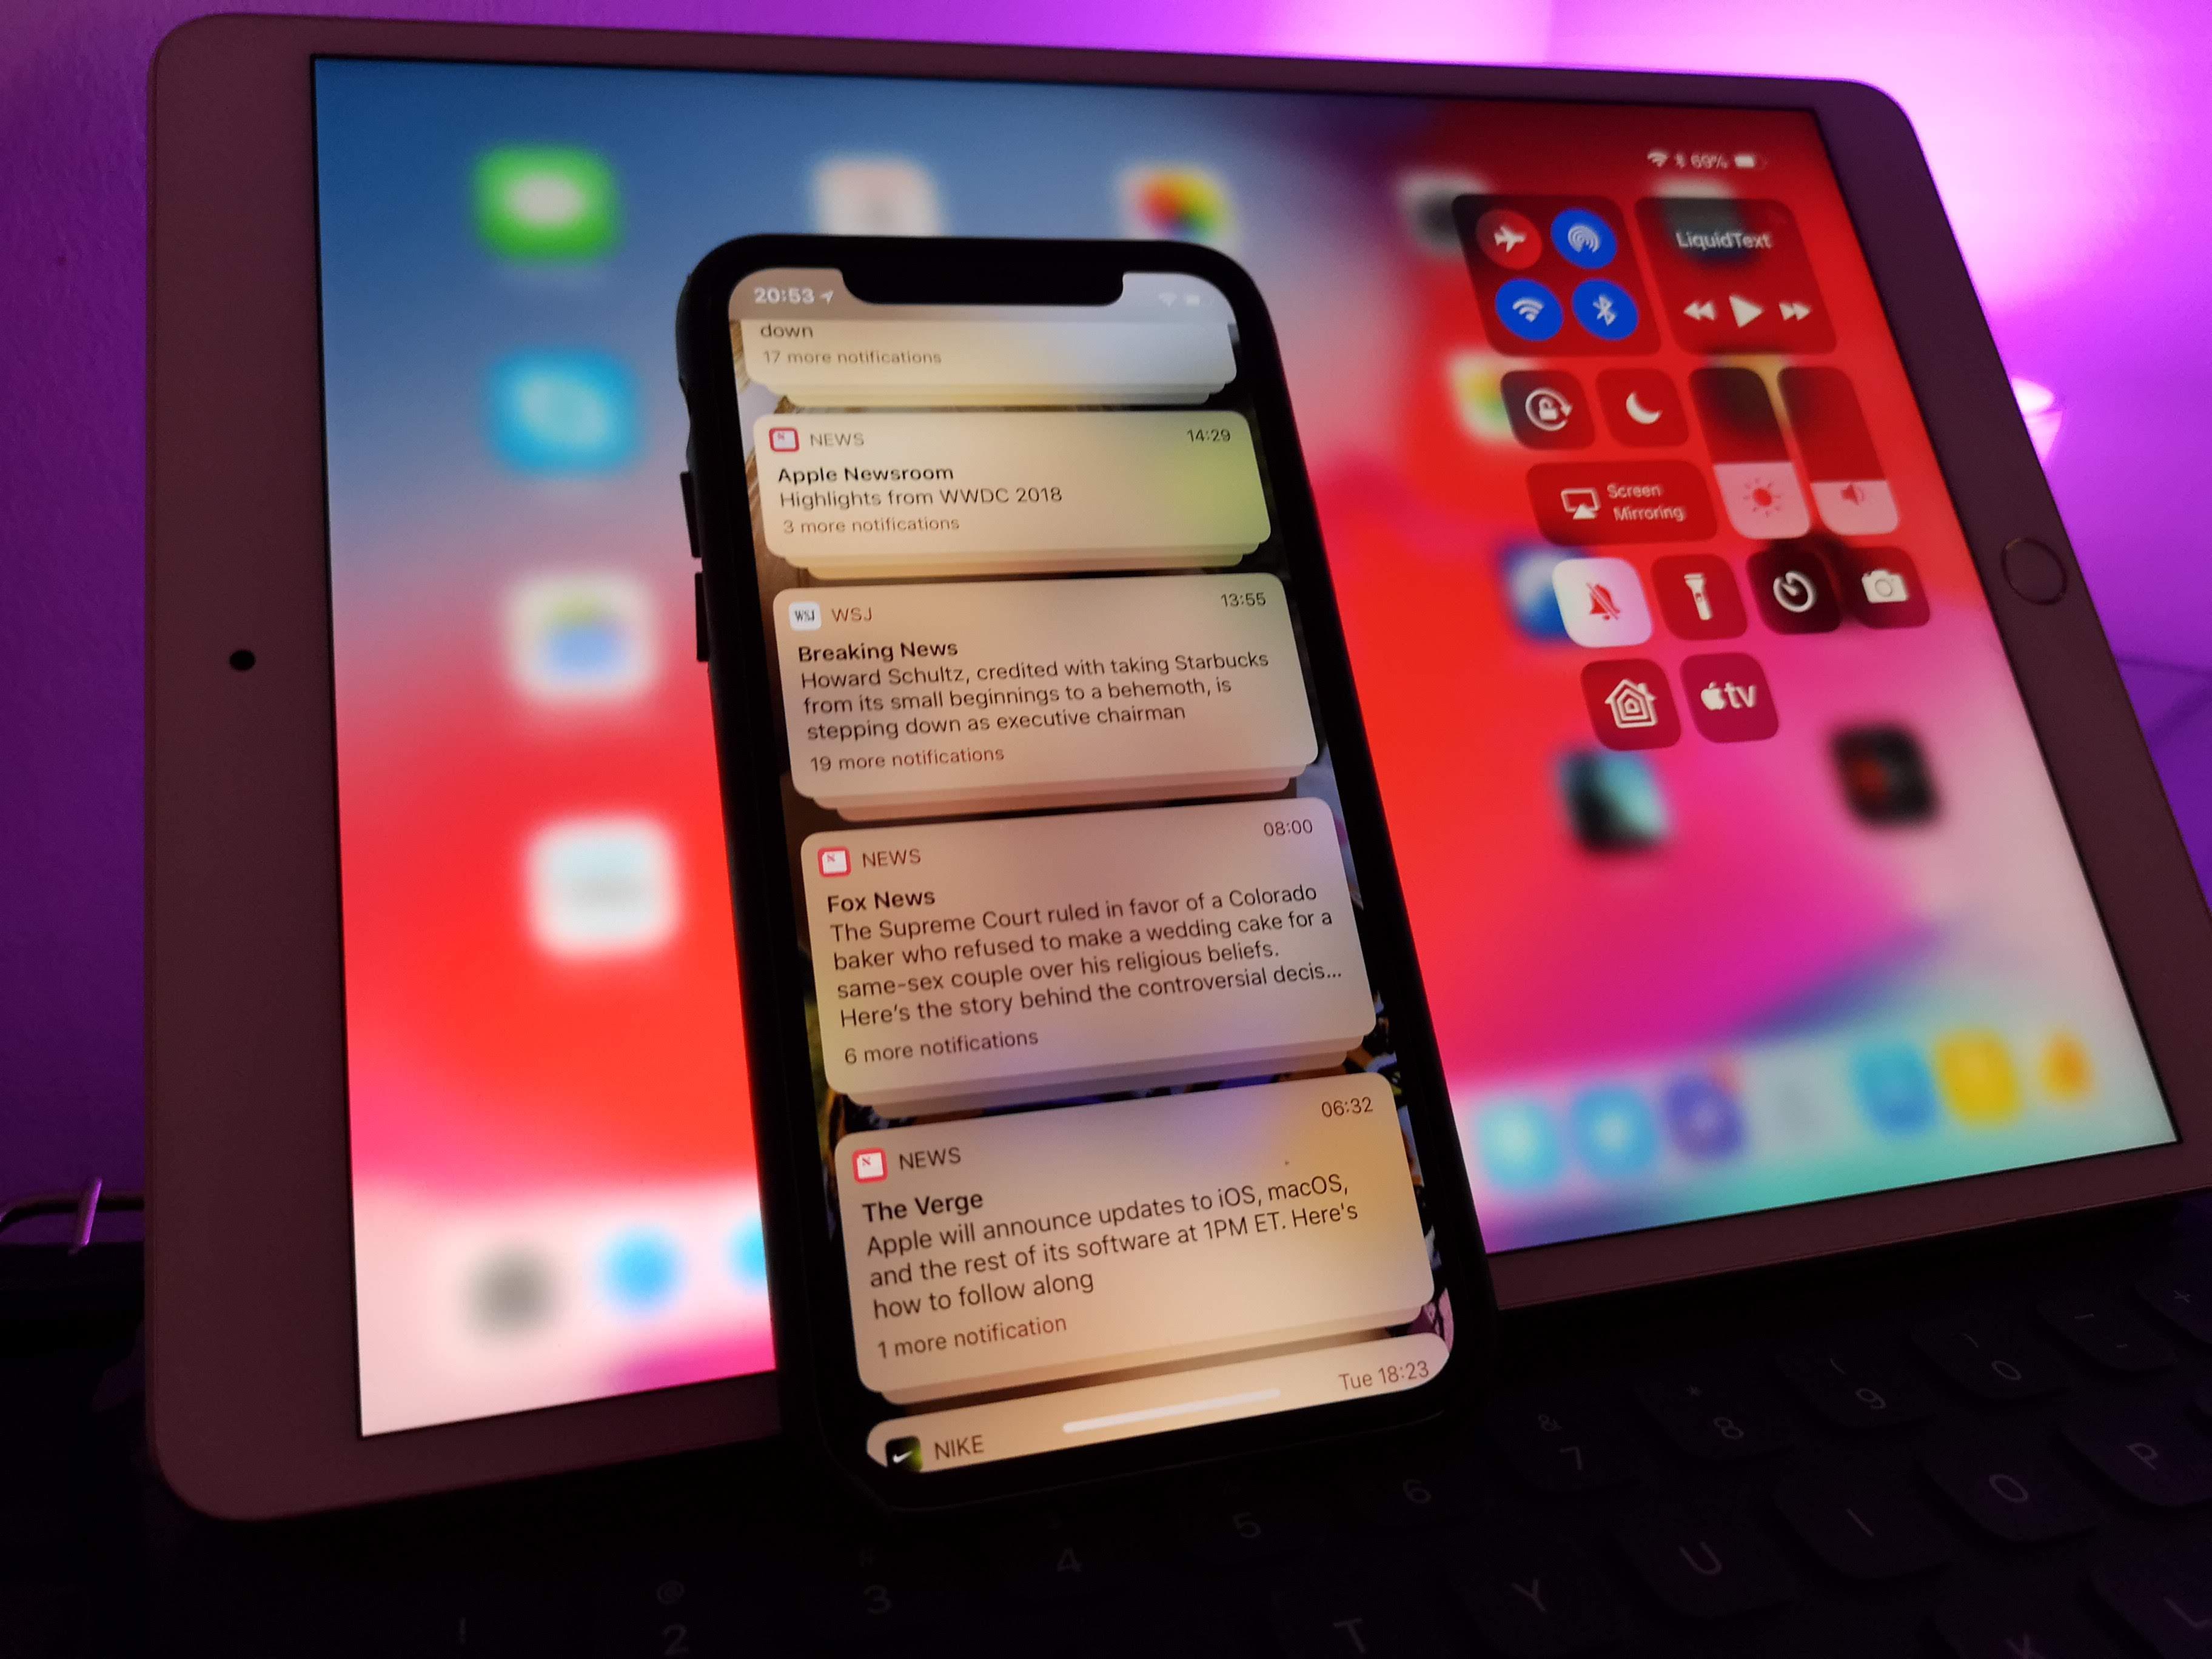 SNIKTITT - iOS 12: gled deg